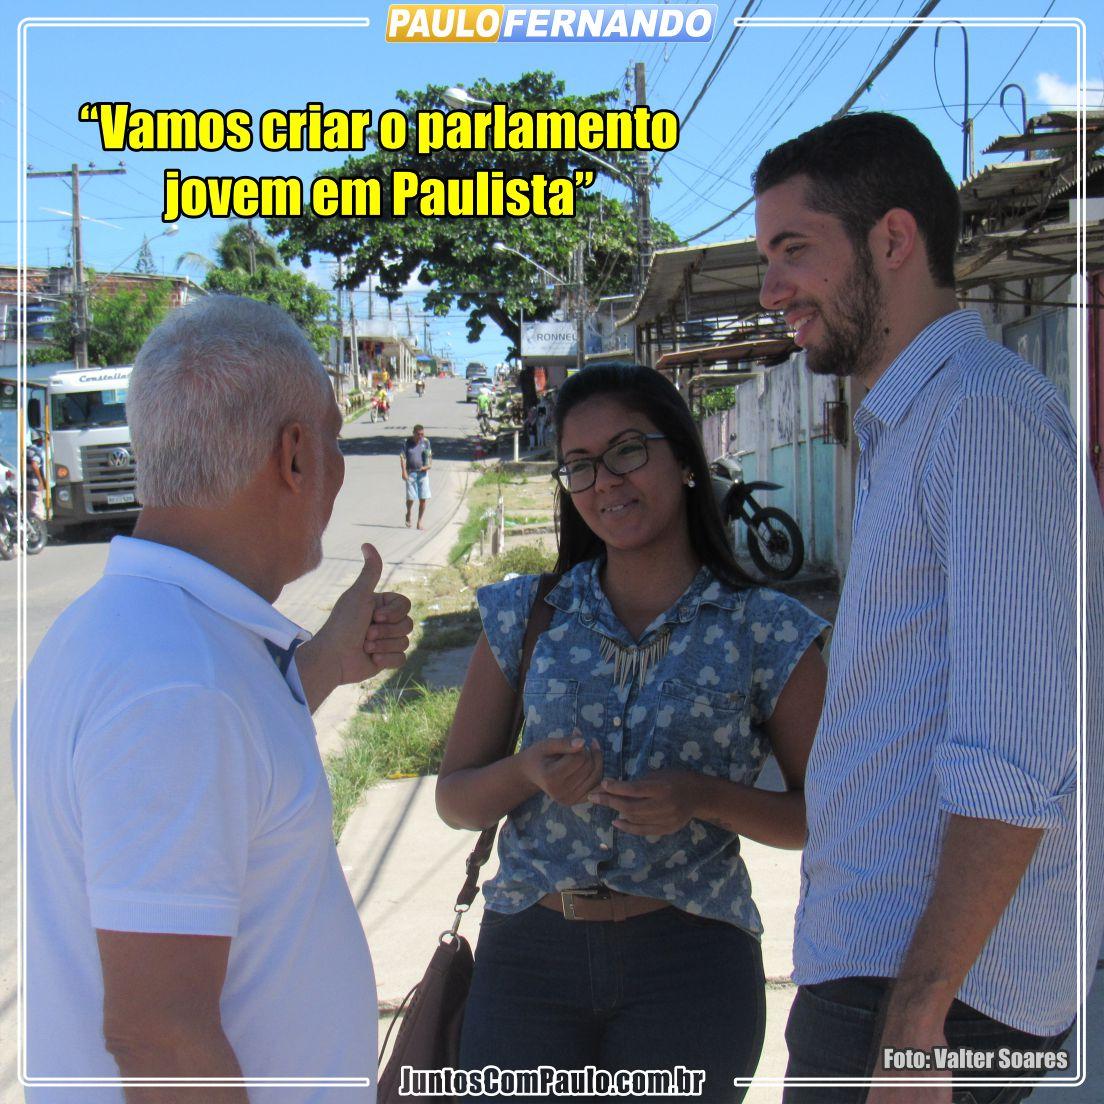 Paulo Fernando sempre inovando